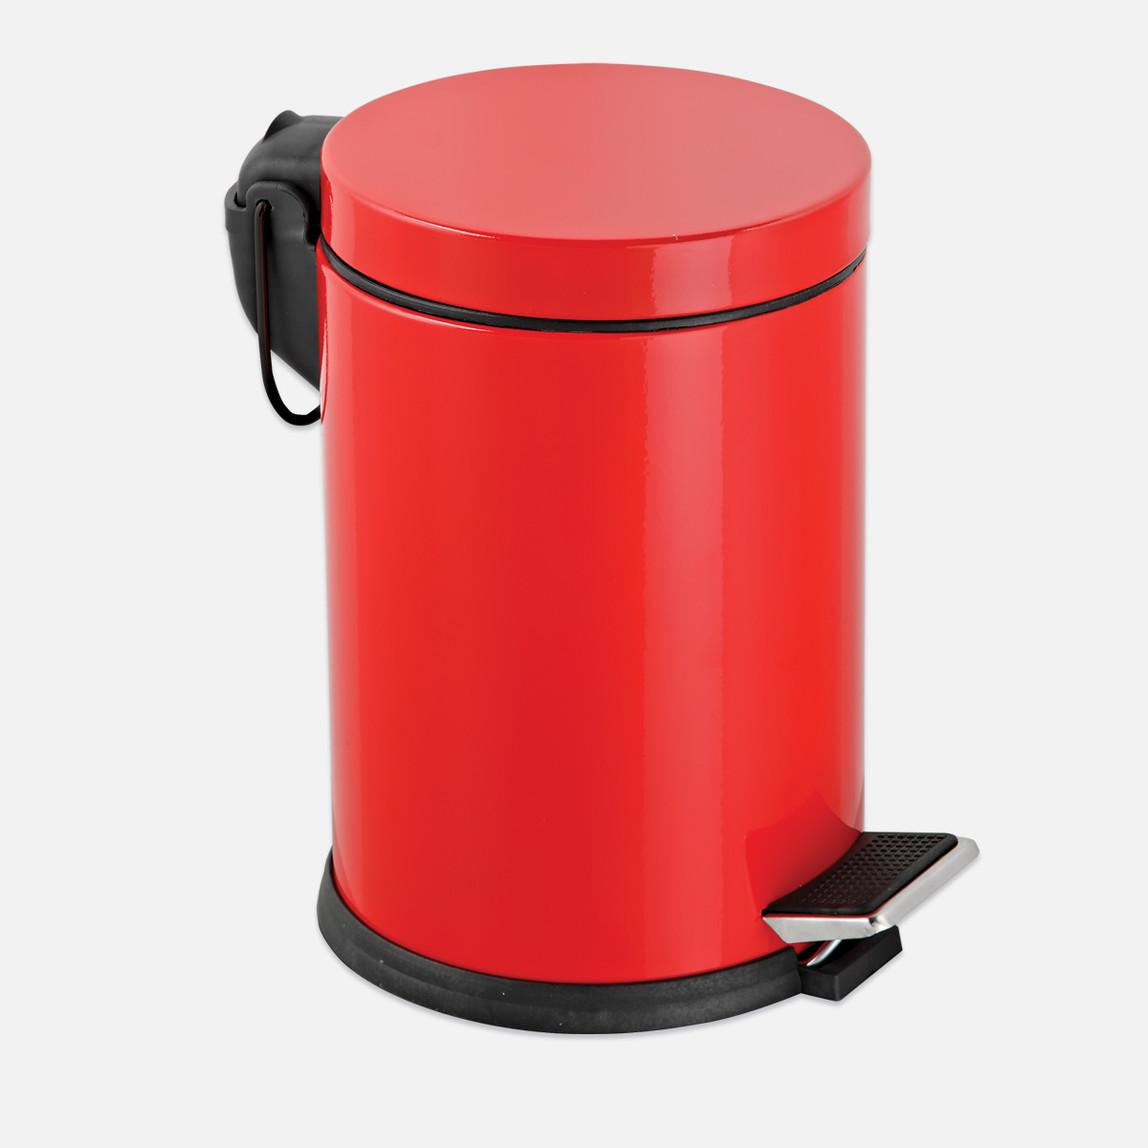 Pedallı Çöp Kovası Kırmızı